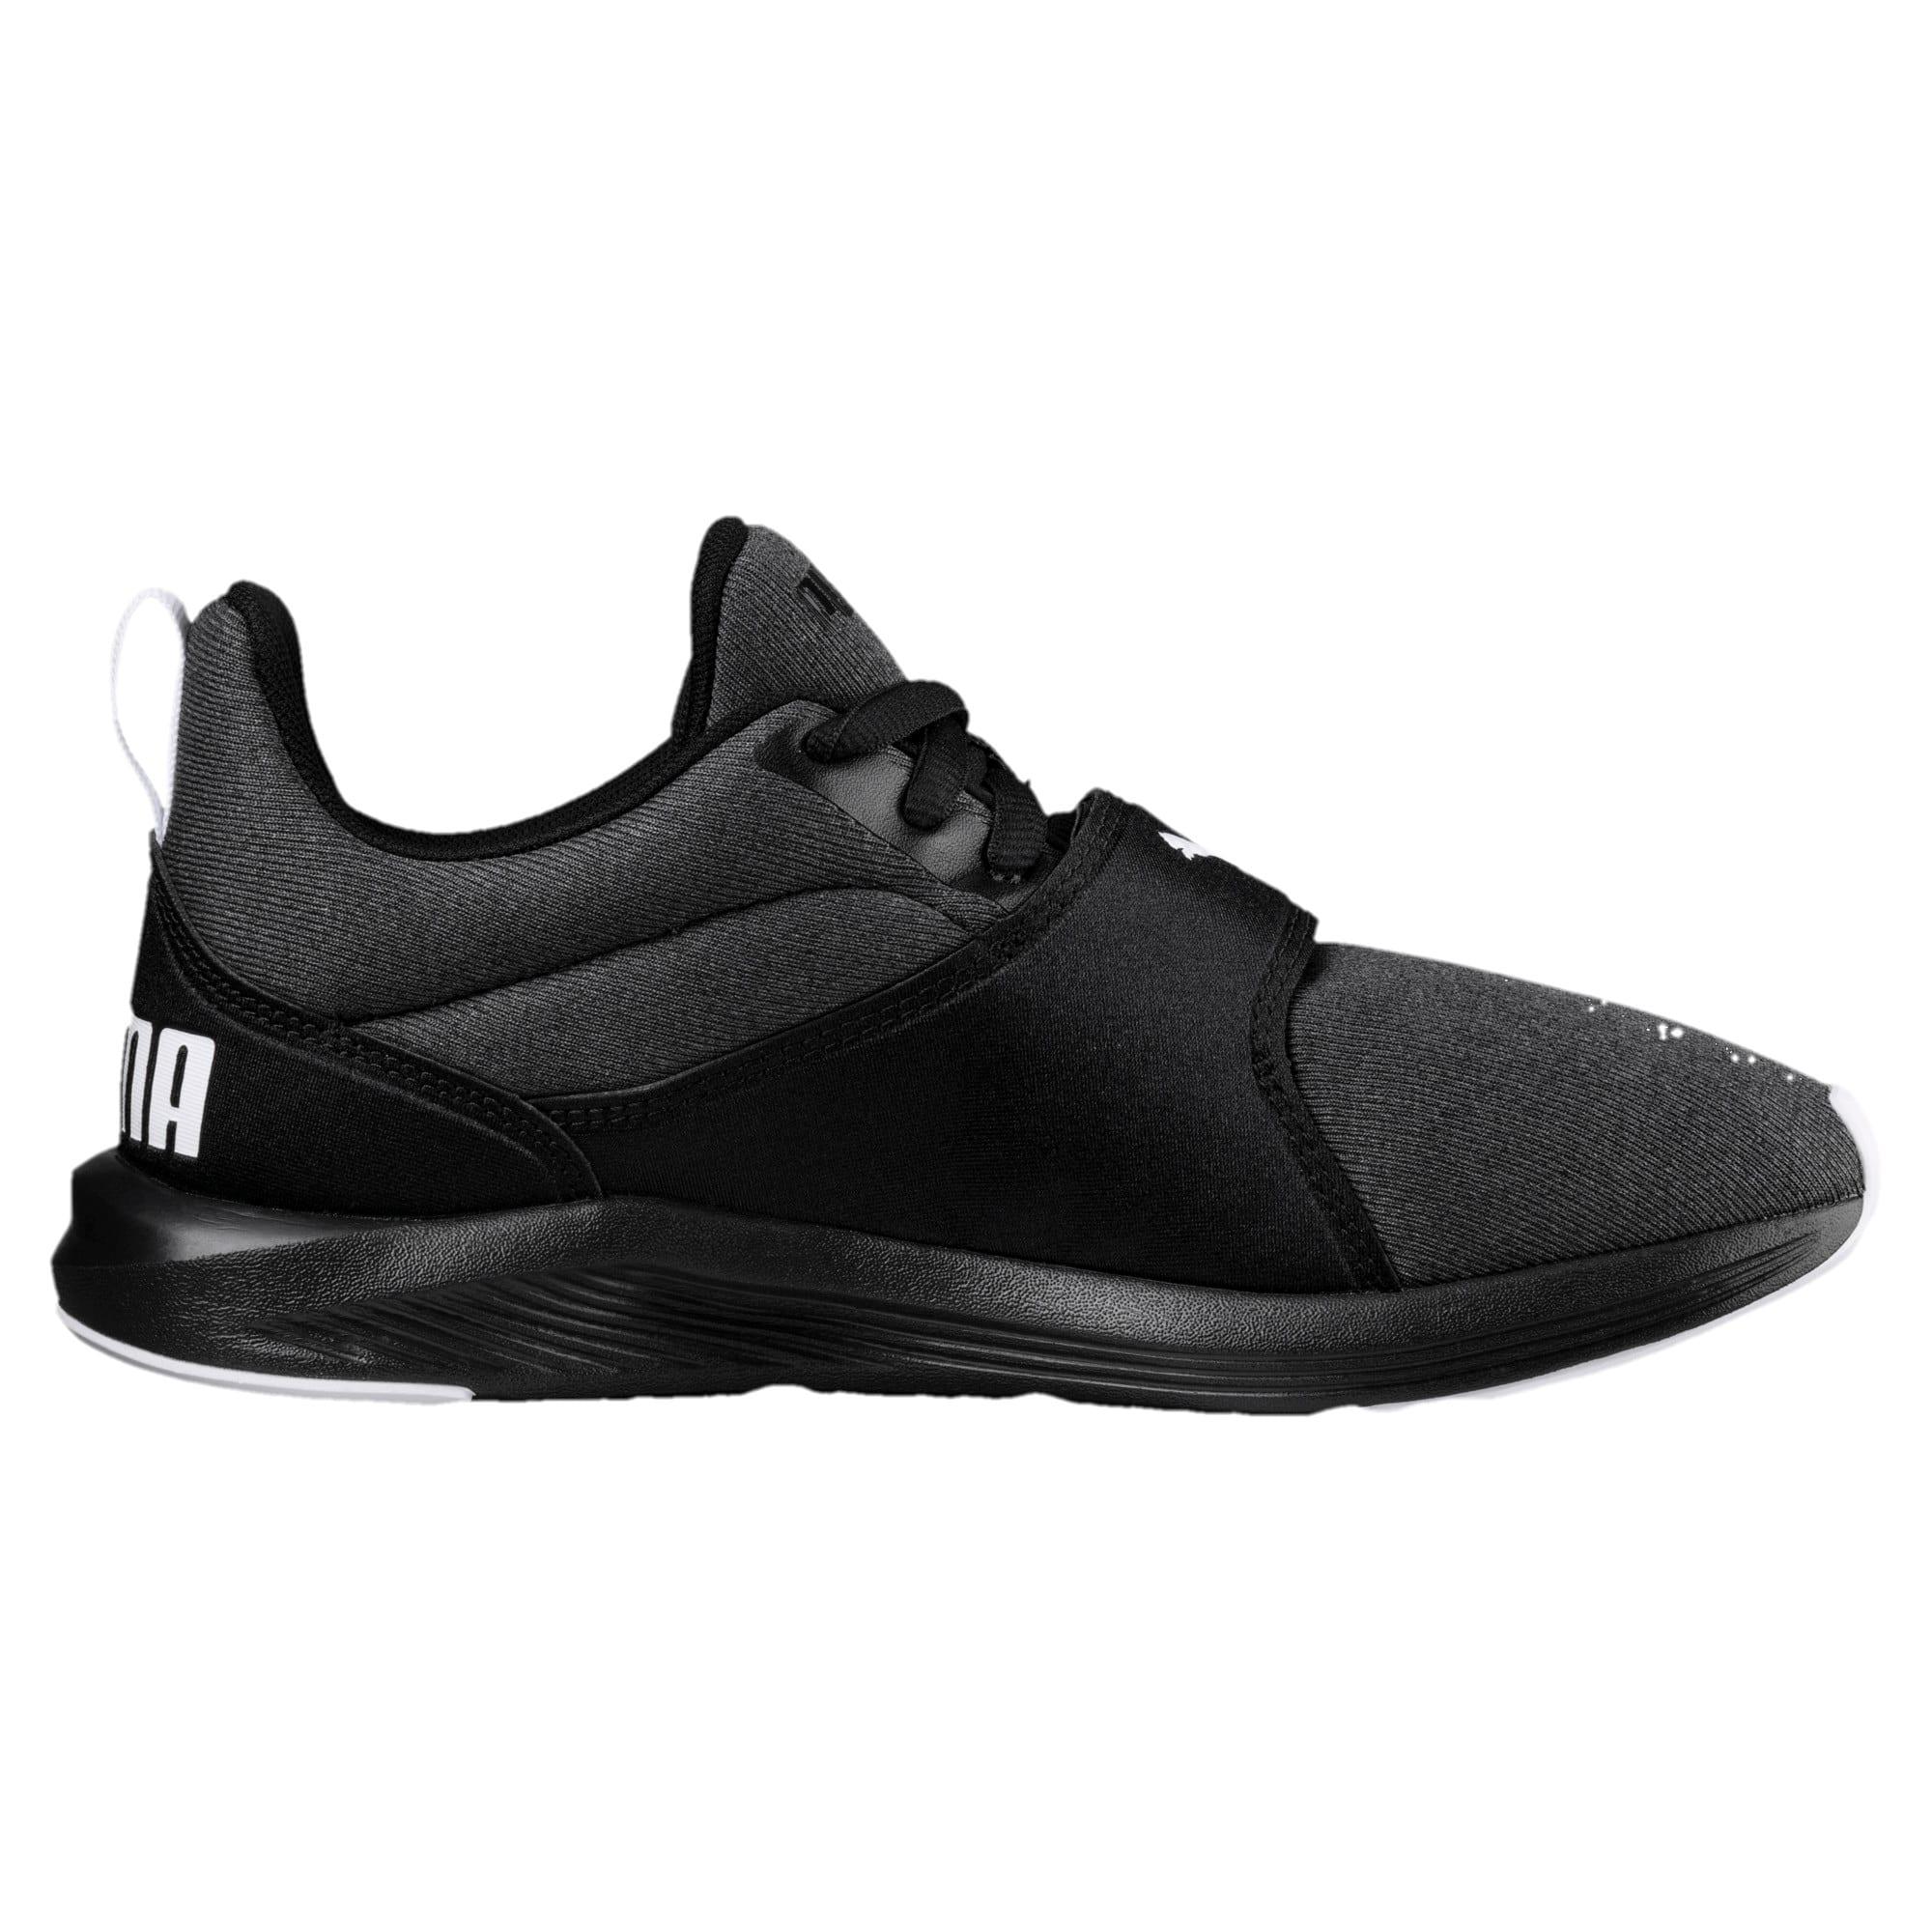 sale uk designer fashion pre order Prodigy Women's Training Shoes